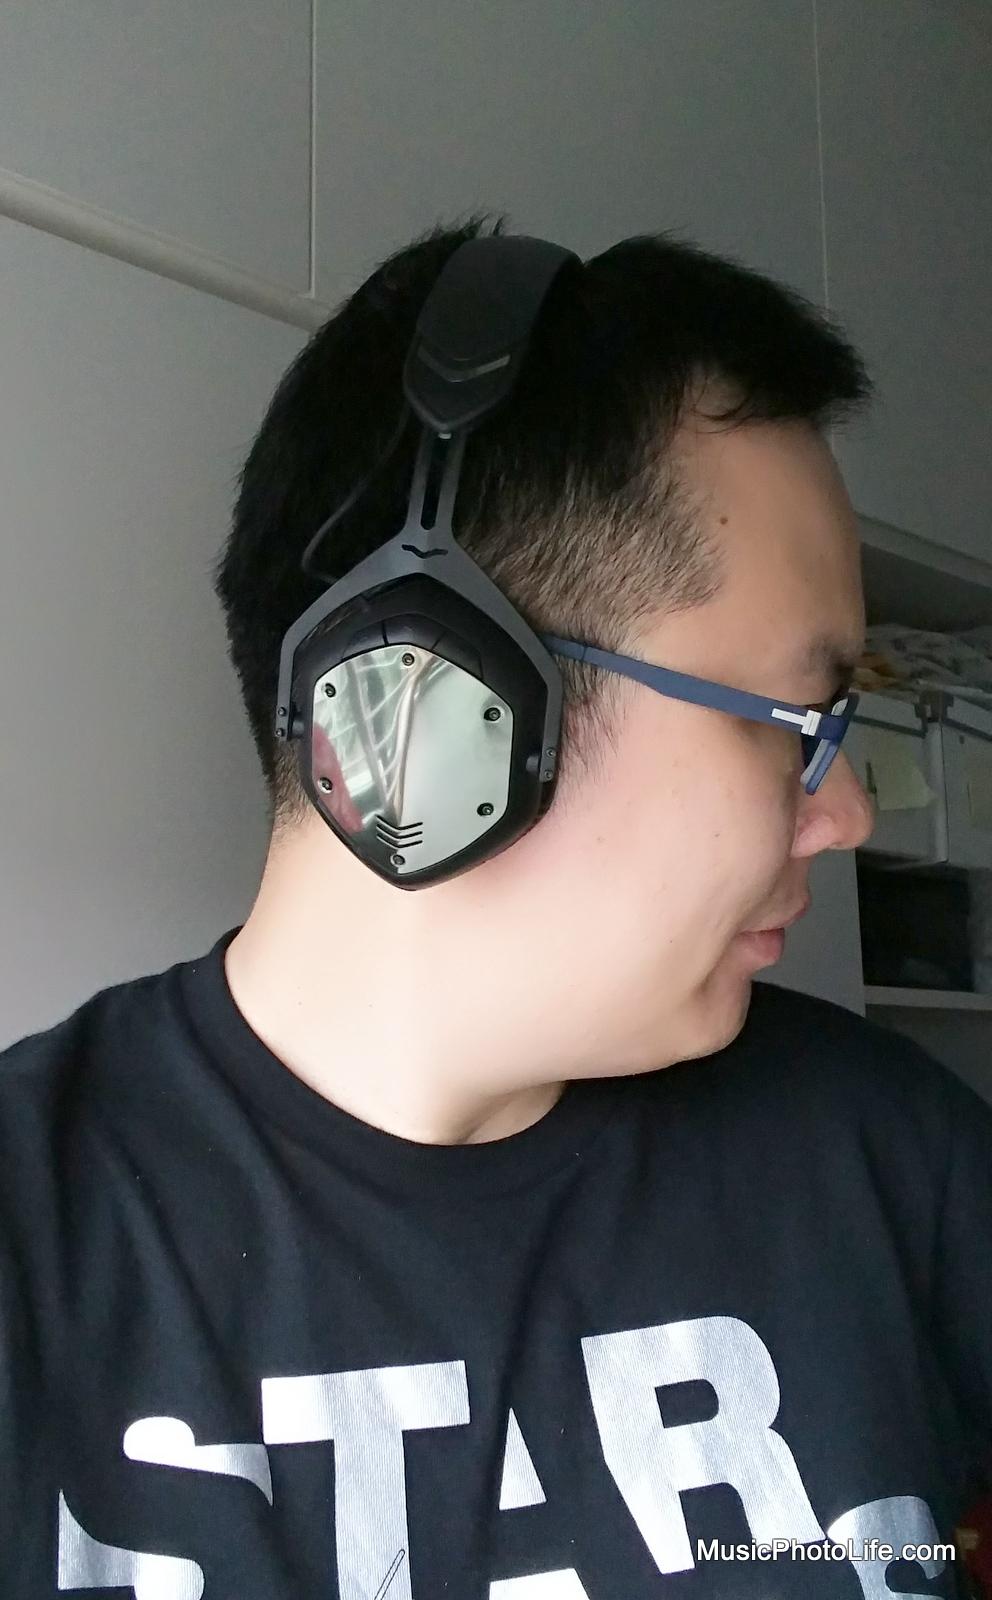 V-MODA Crossfade Wireless on my ears